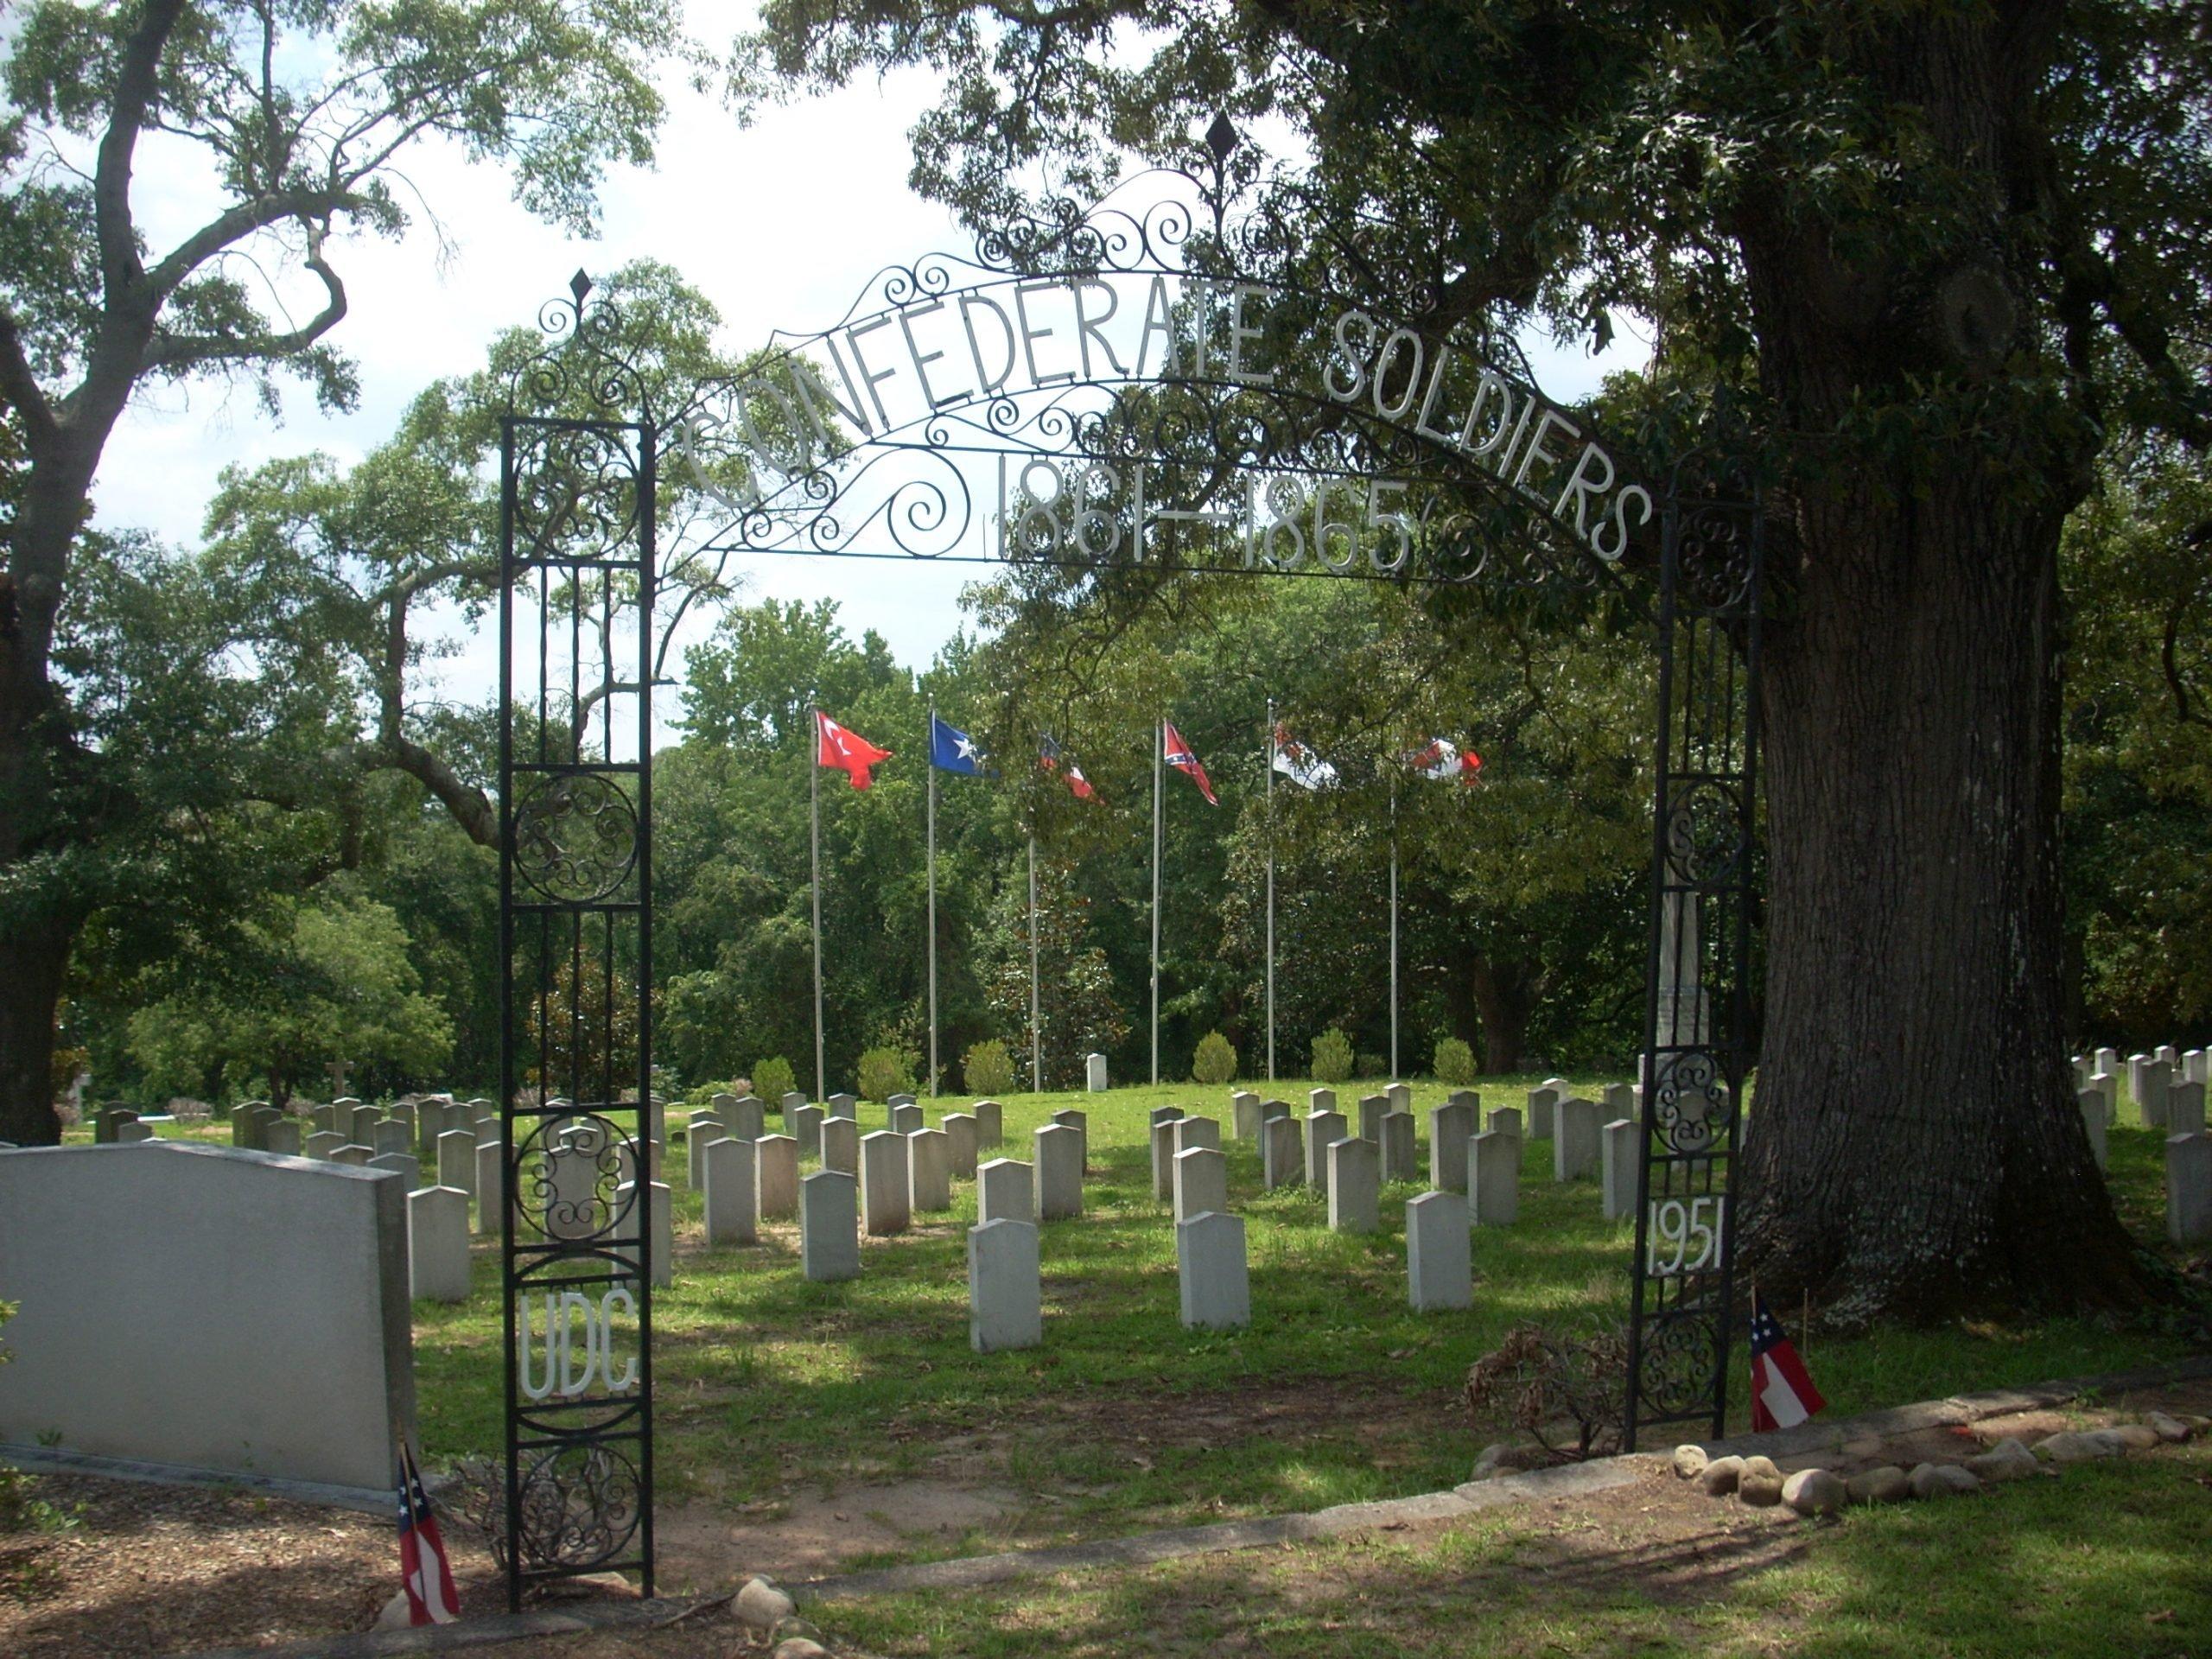 Elmwood Cemetery (Columbia, South Carolina)